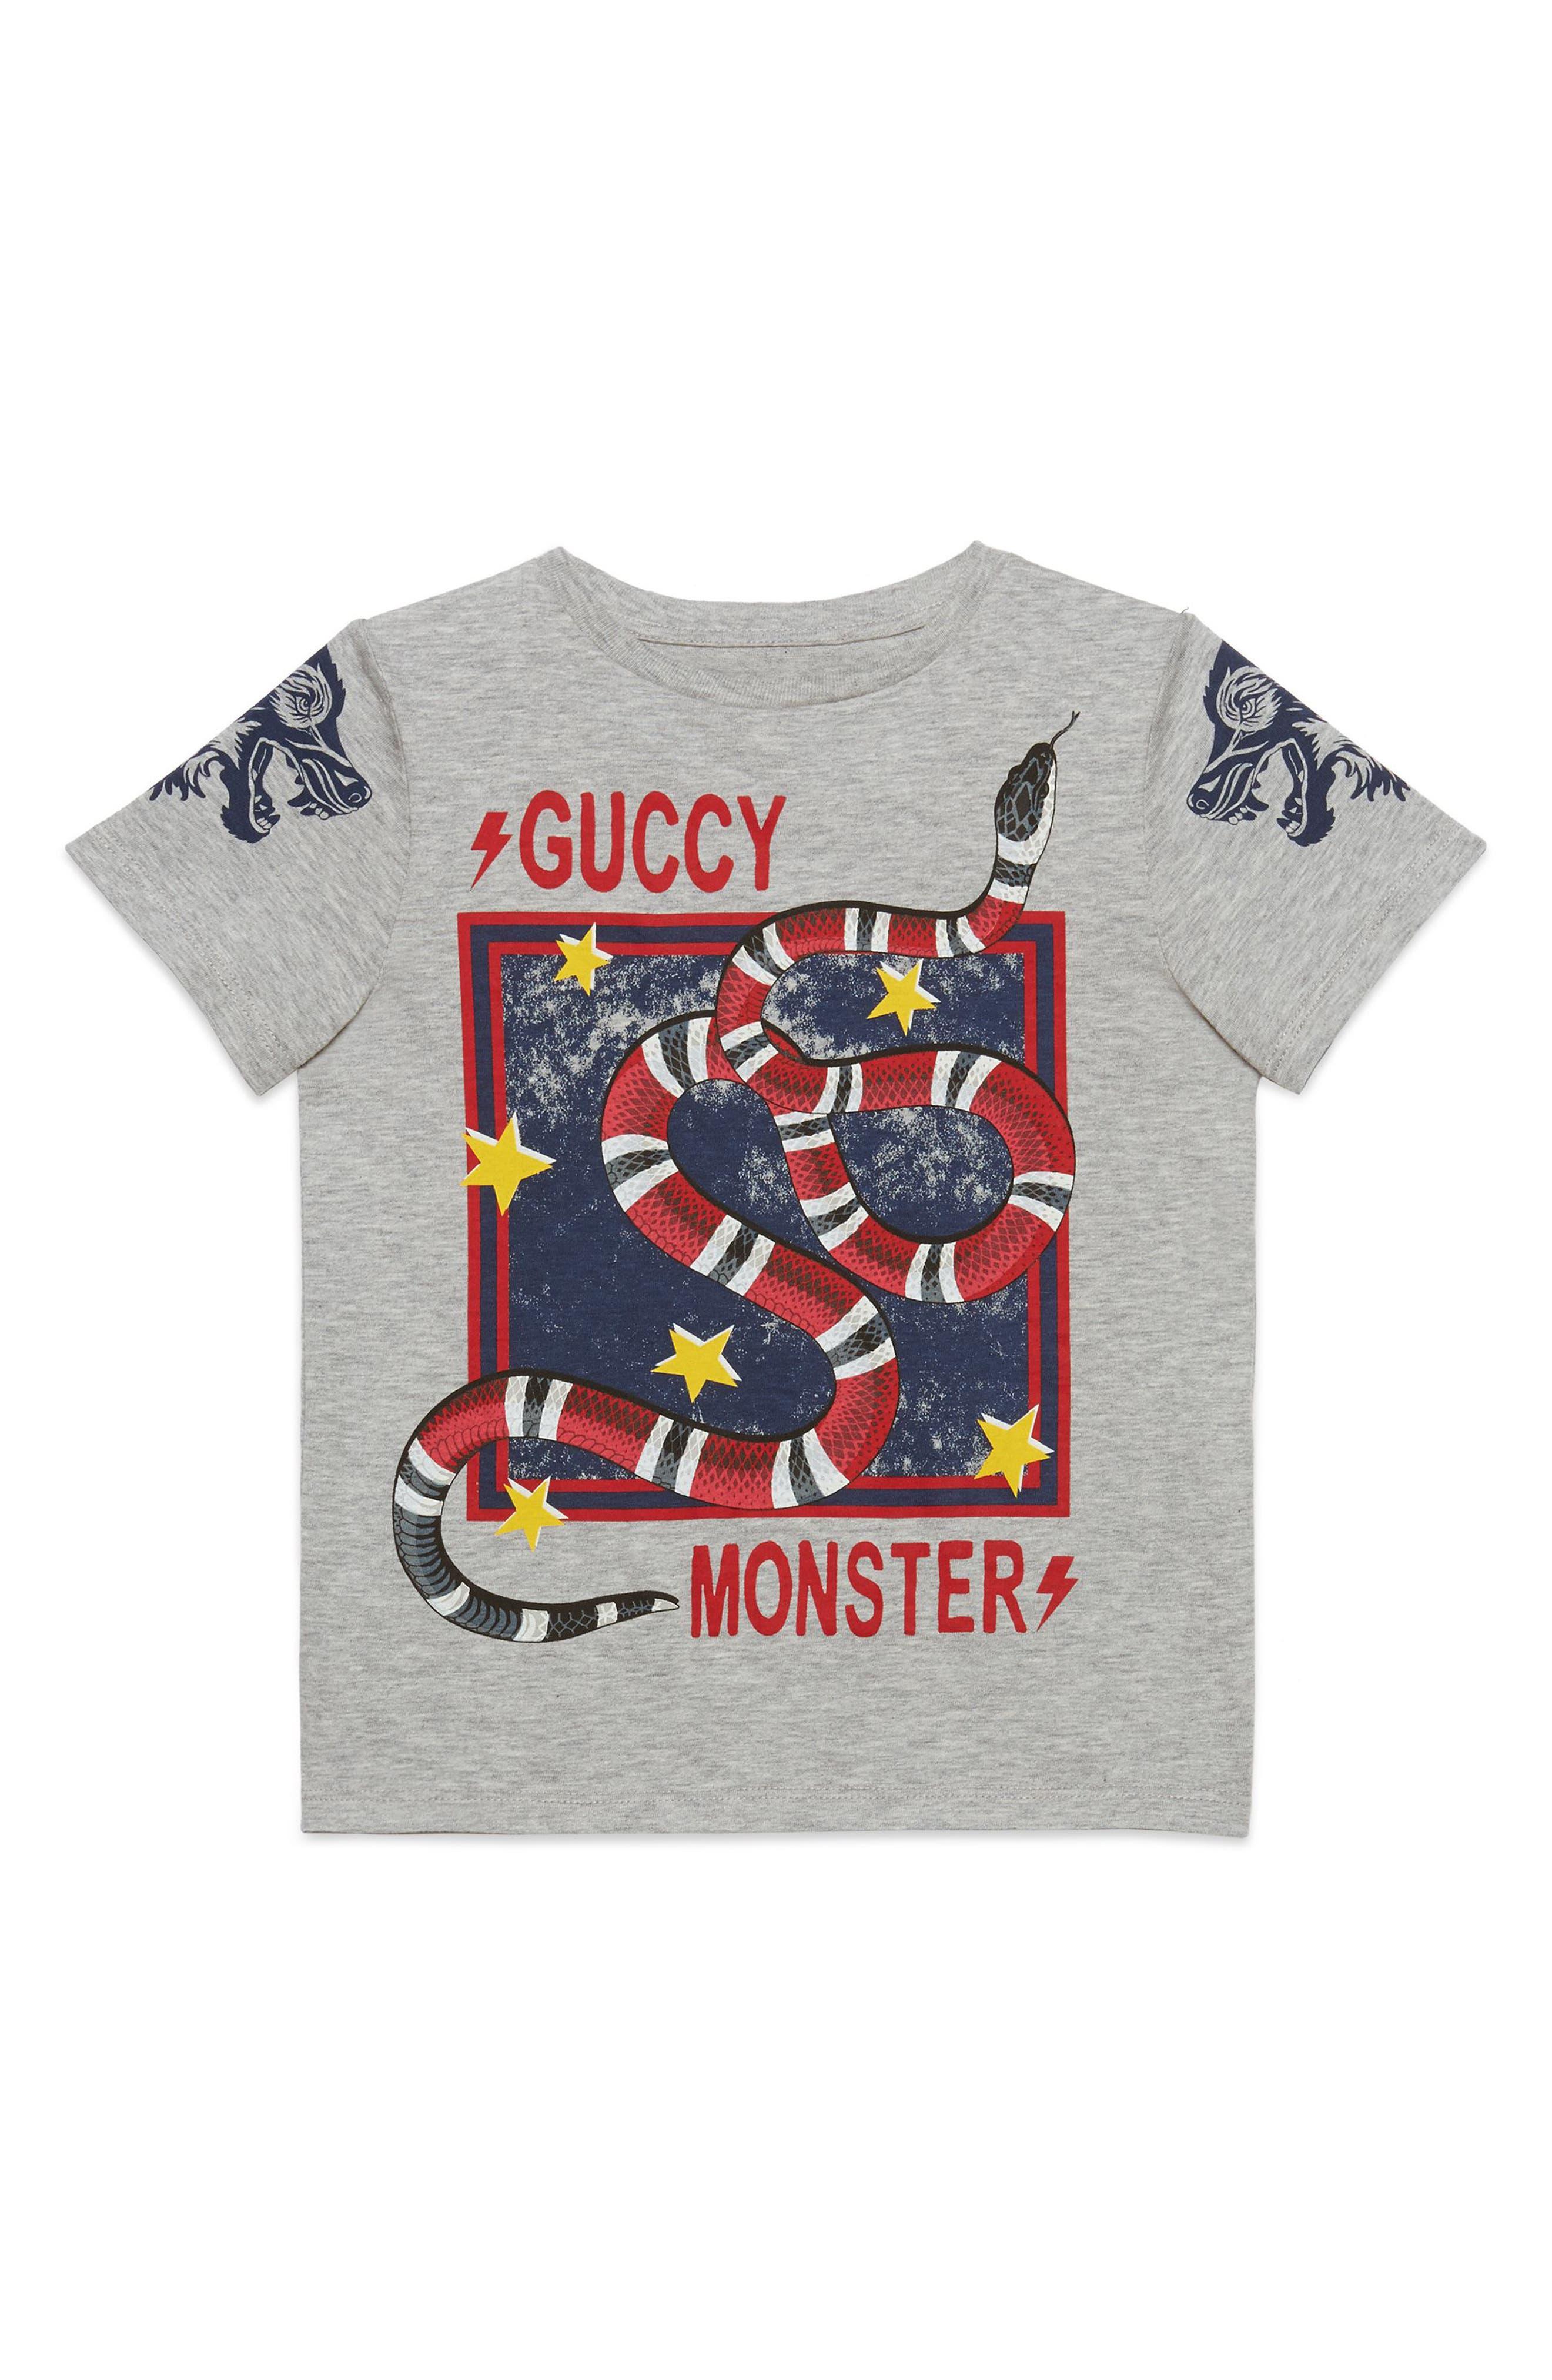 Guccy Monster & King Snake Graphic T-Shirt,                         Main,                         color, L.GREY MEL B/ R/ B